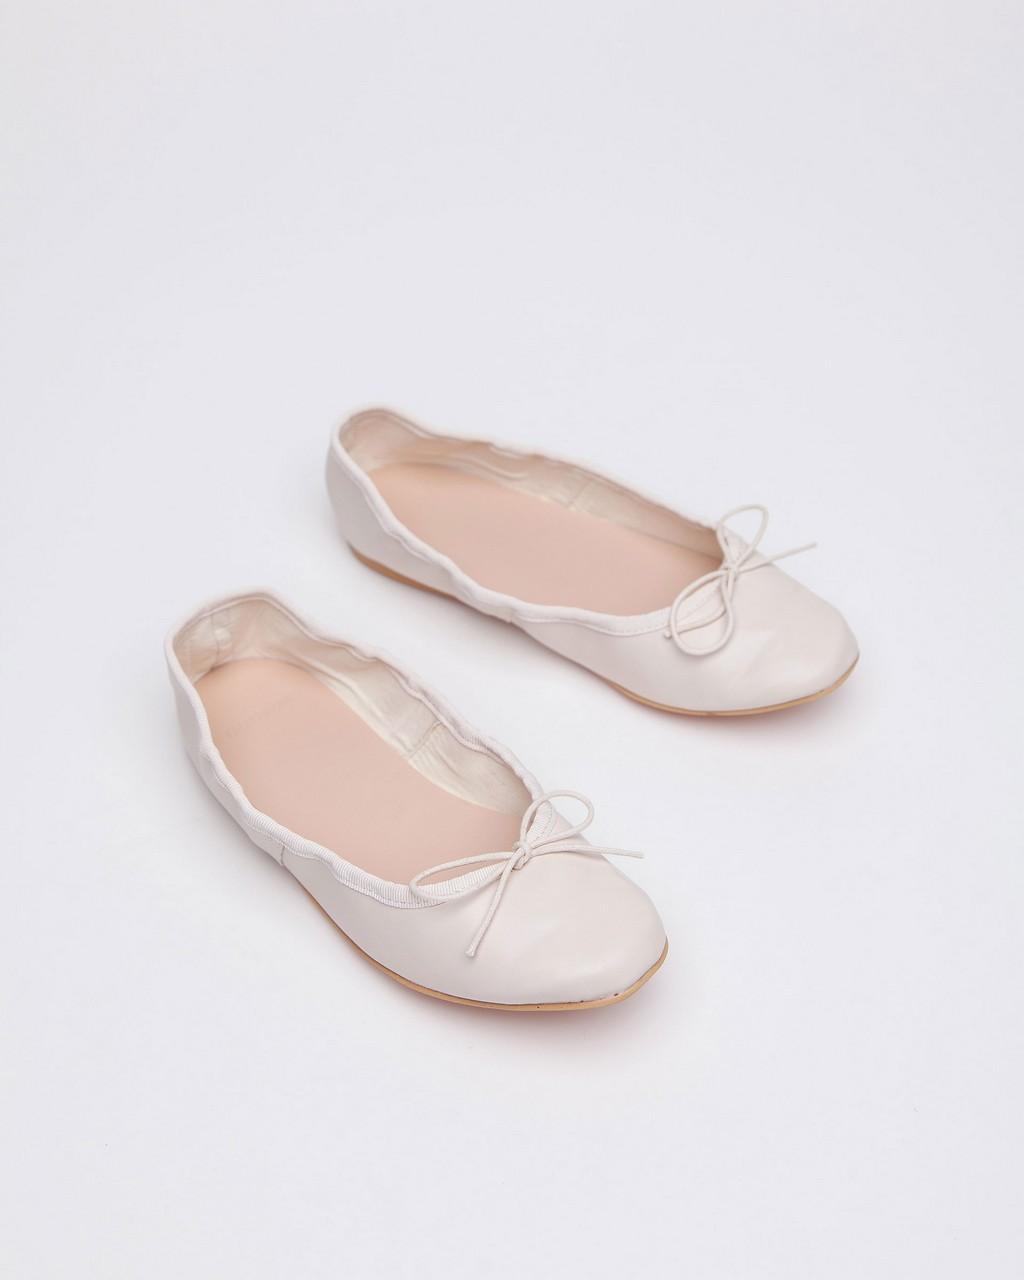 Tagtraume E.Ballerina - Beige(베이지)